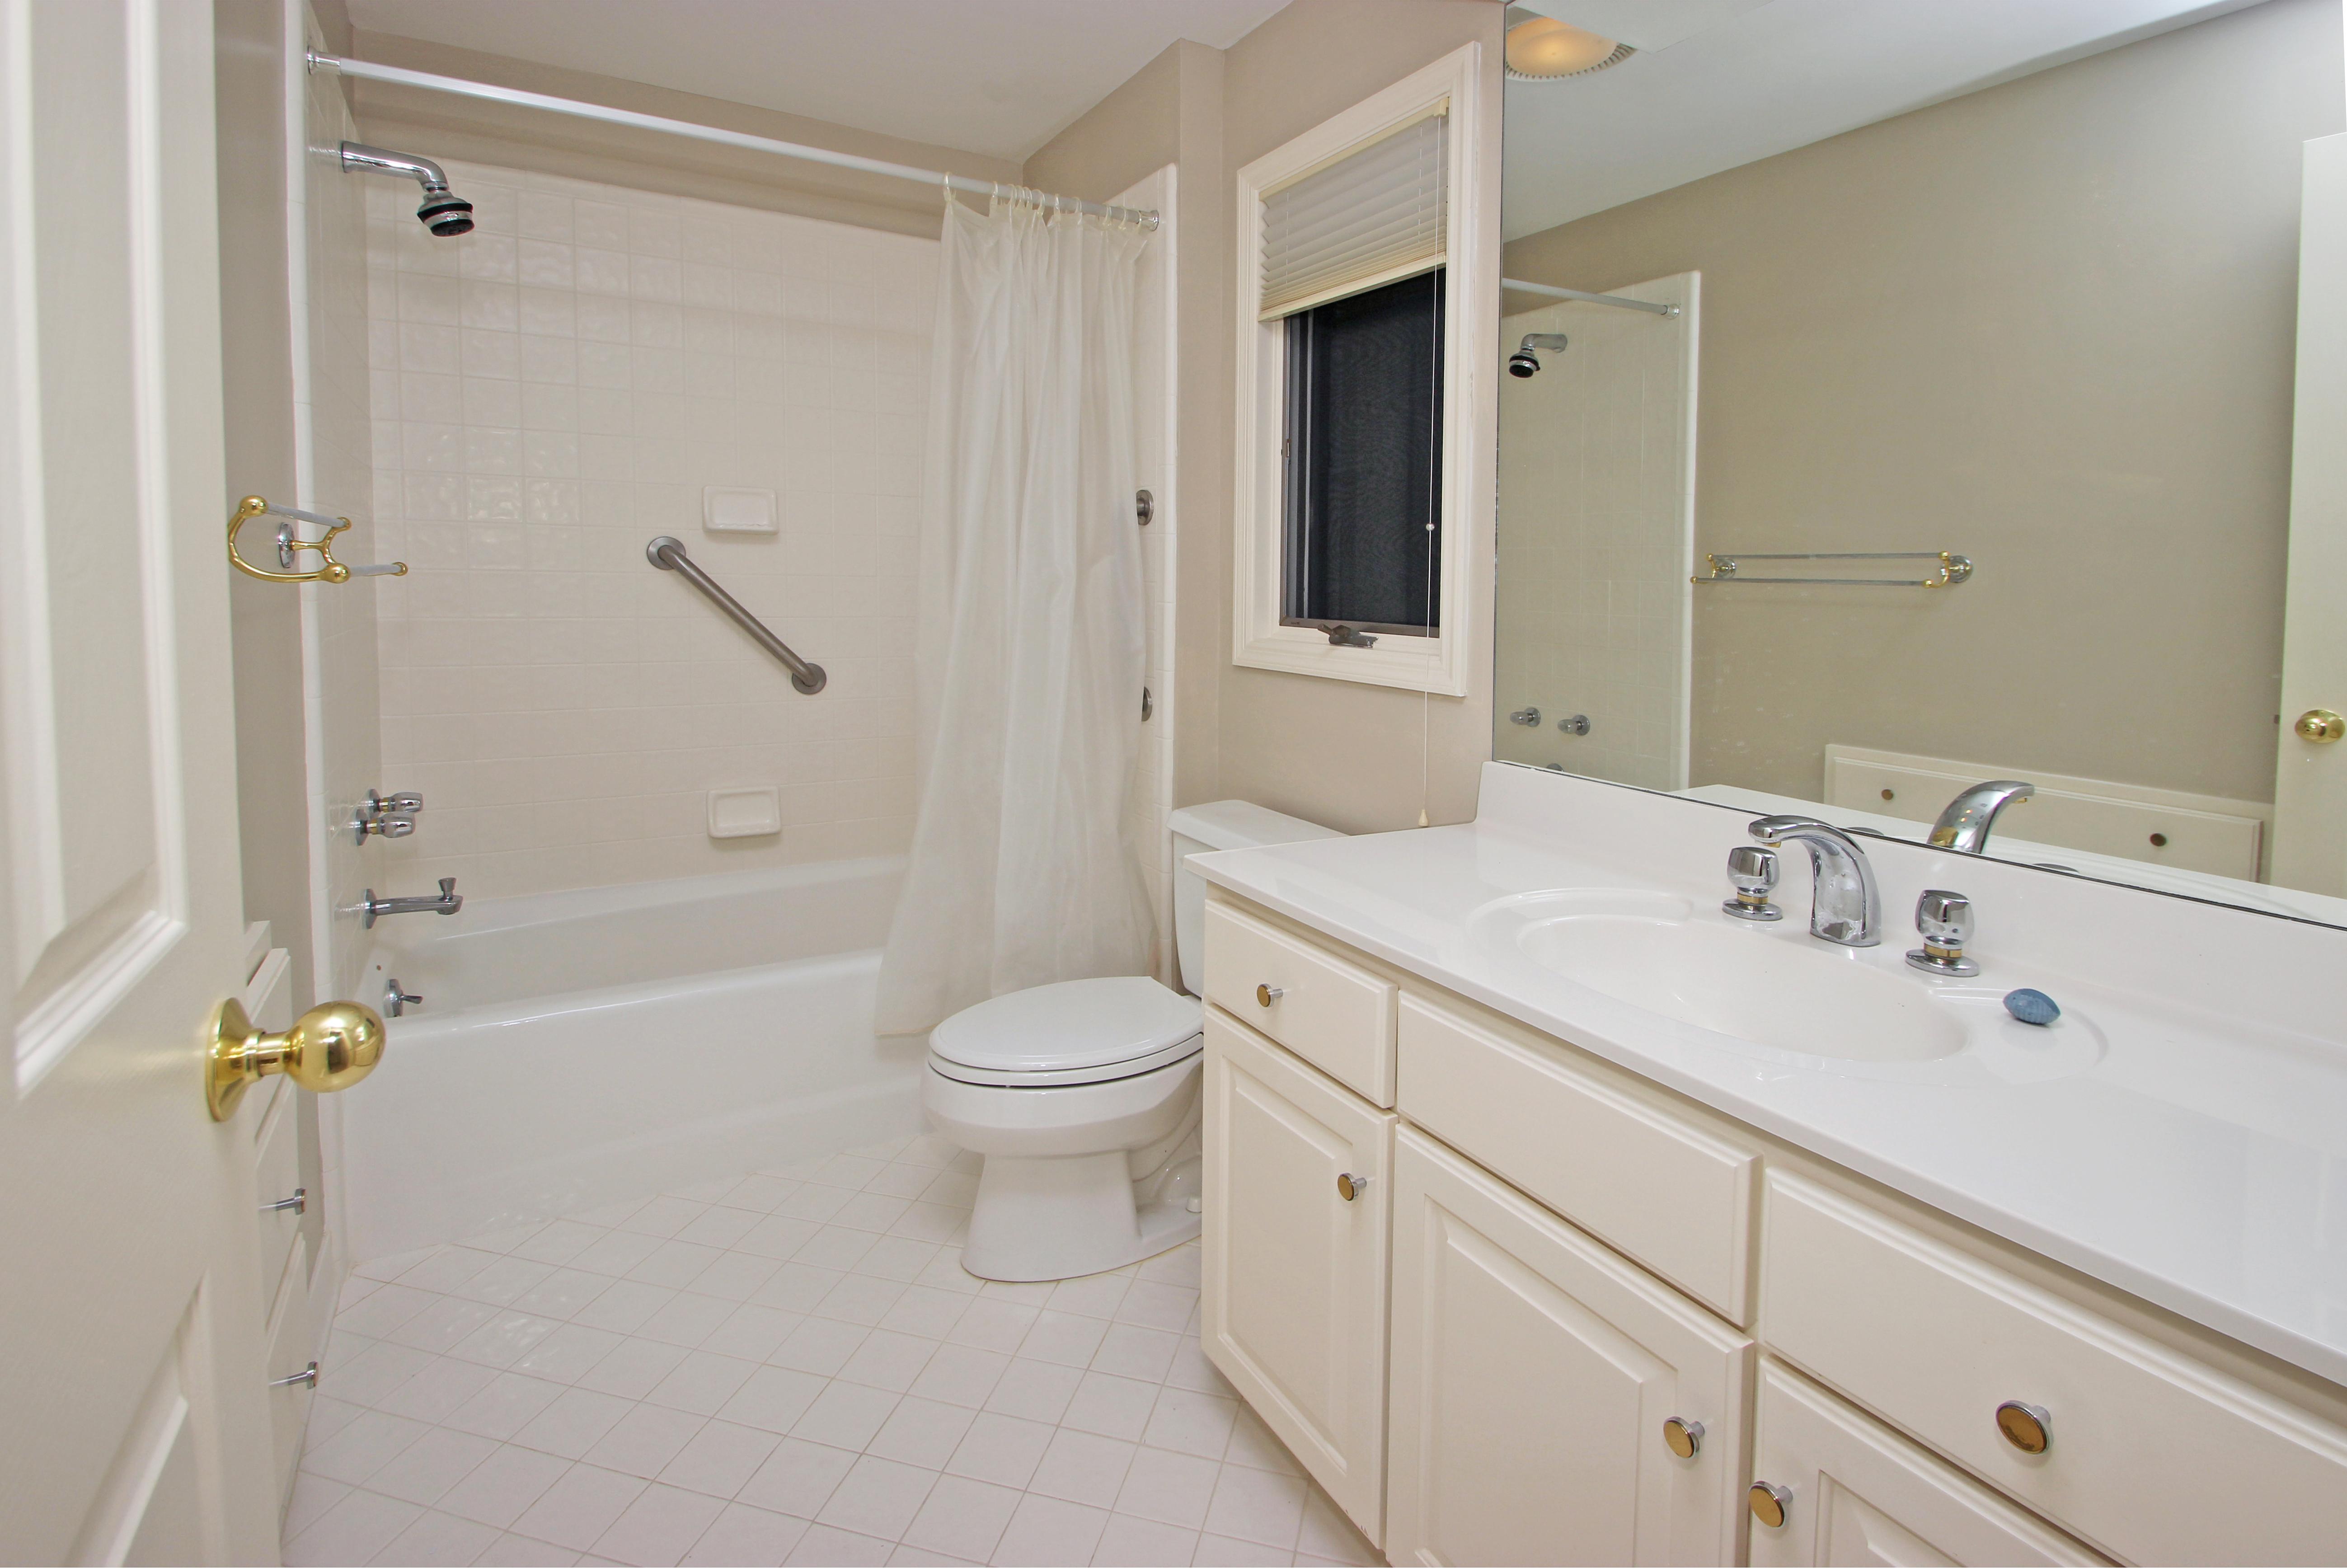 HI - Guest bath - 1st level